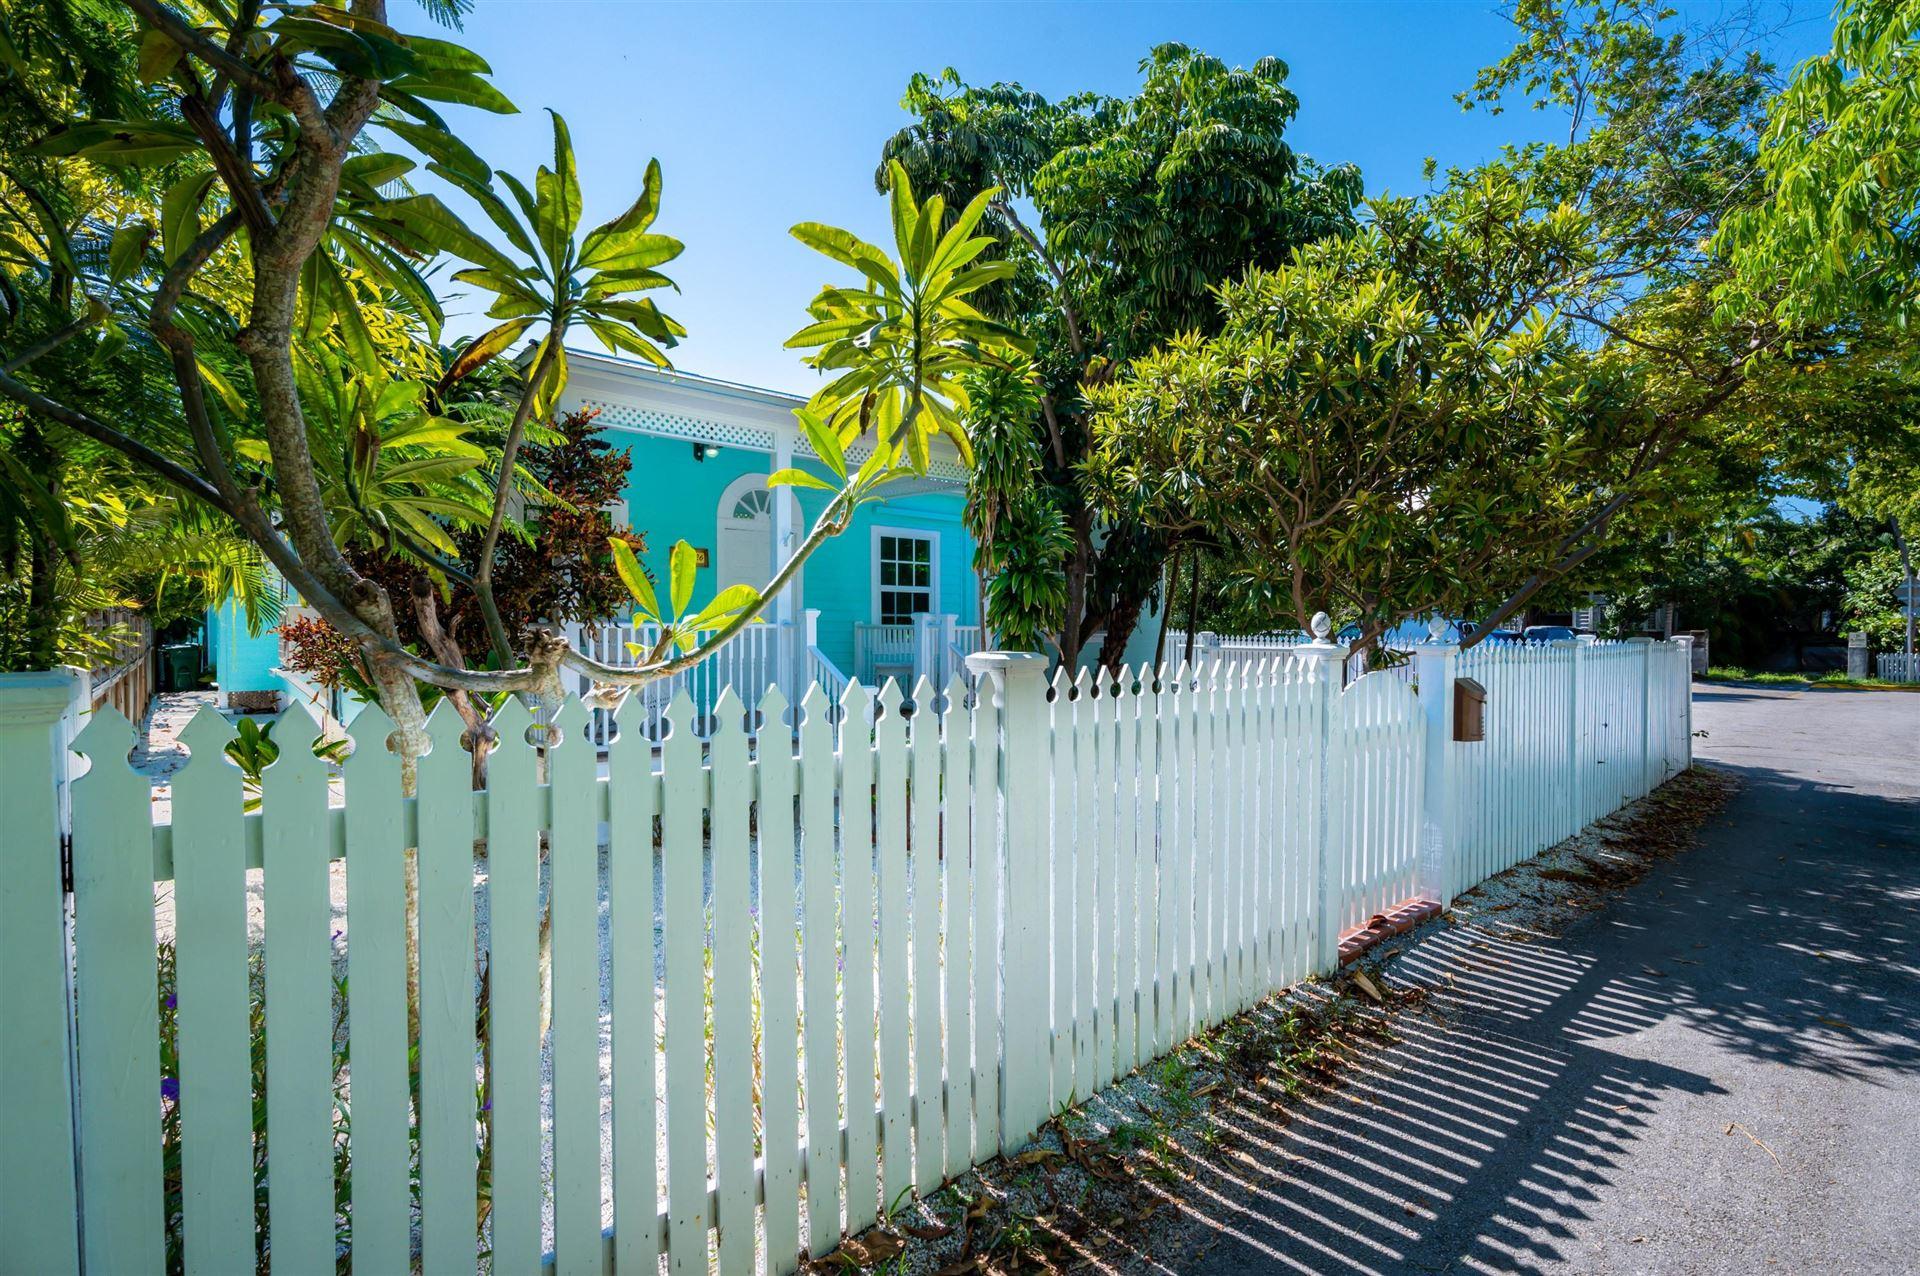 726 Poor House Lane, Key West, FL 33040 - #: 593001